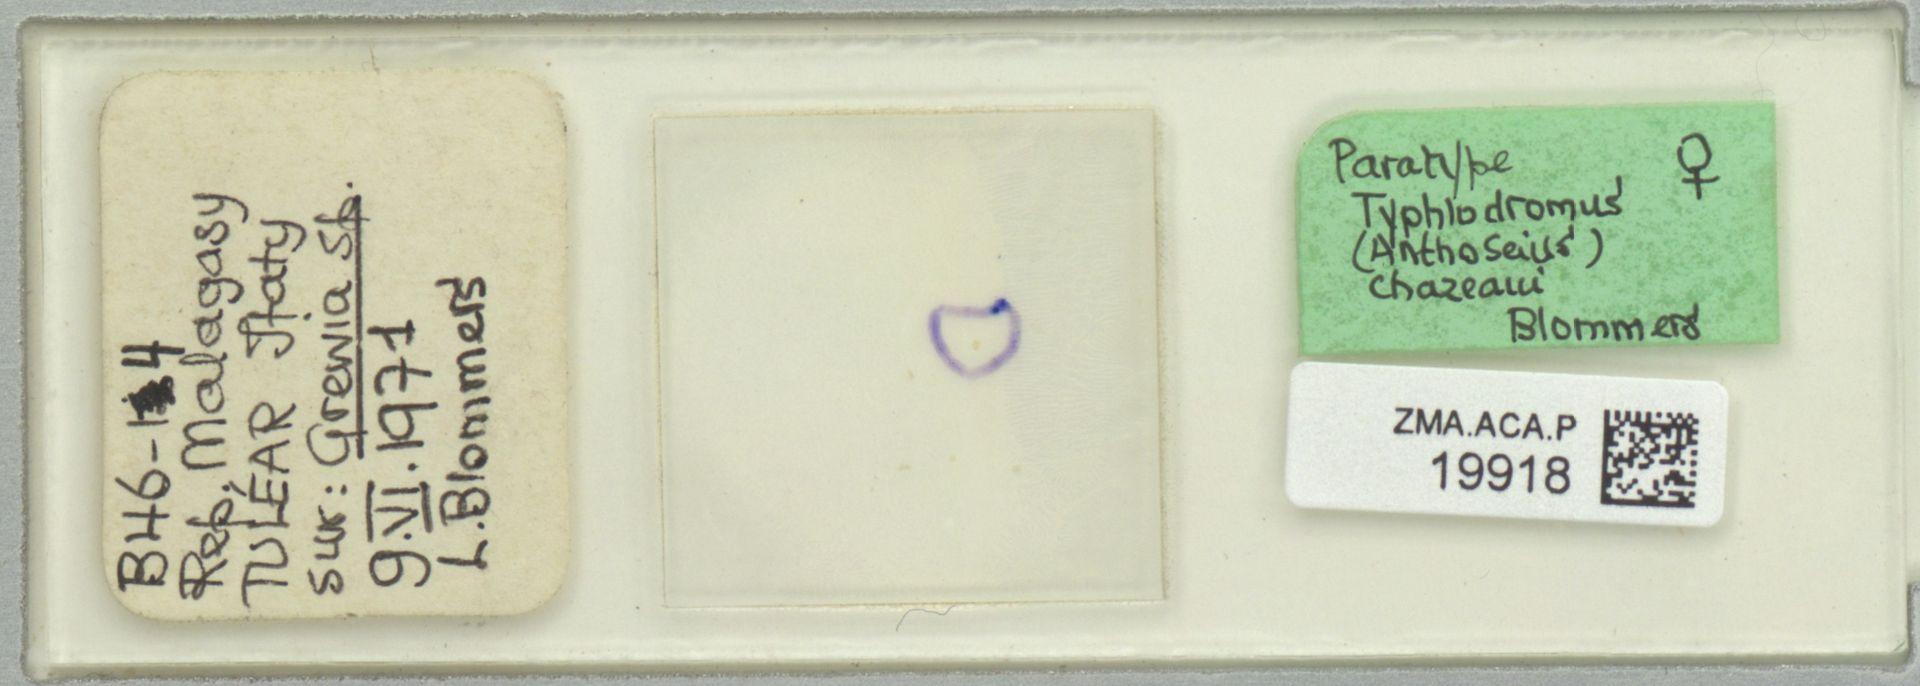 ZMA.ACA.P.19918 | Typhlodromus (Anthoseius) chazeaui